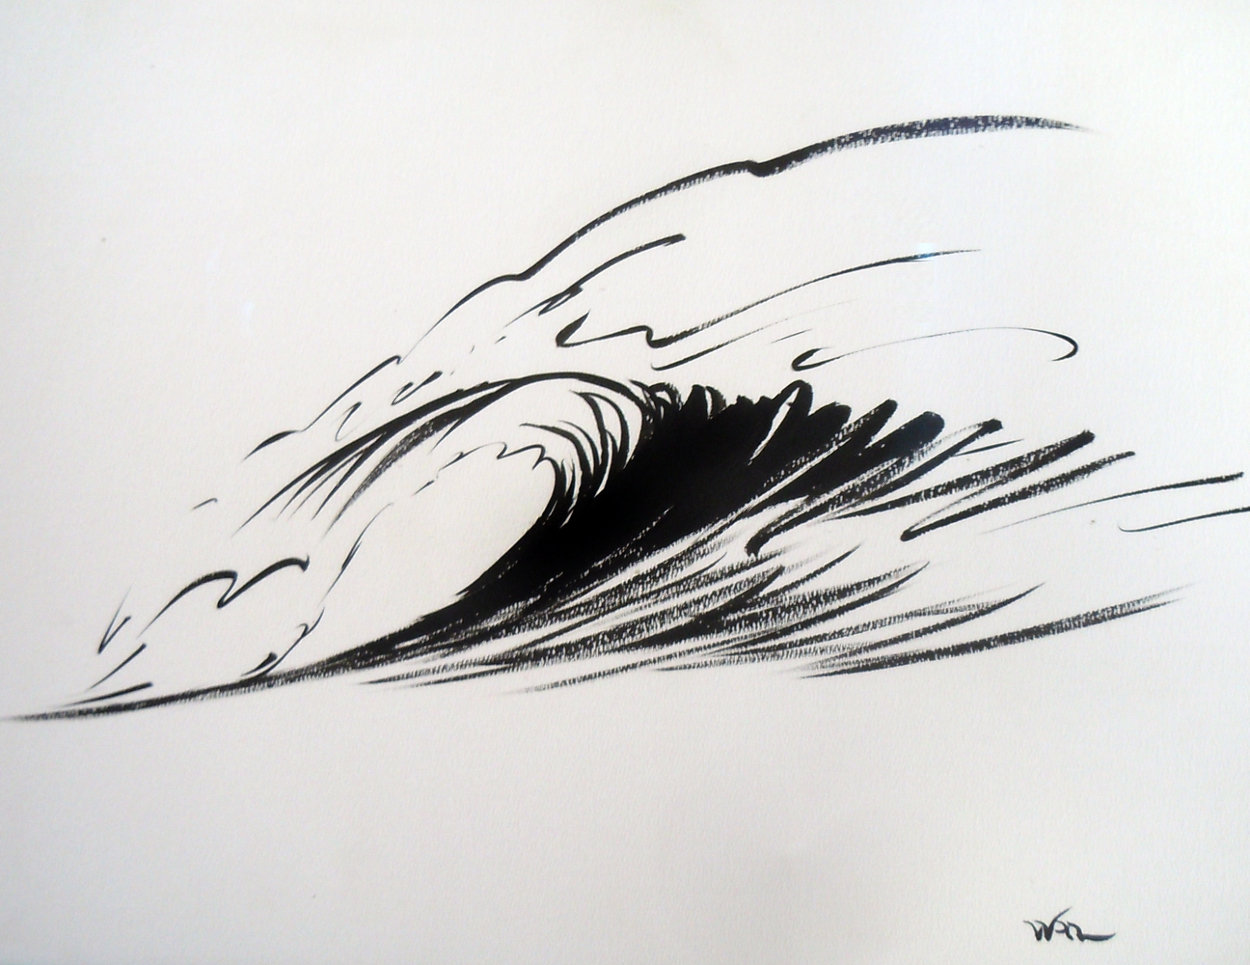 Wave Form Chinese Brush Painting 2008 14x24 Original Painting by Walfrido Garcia